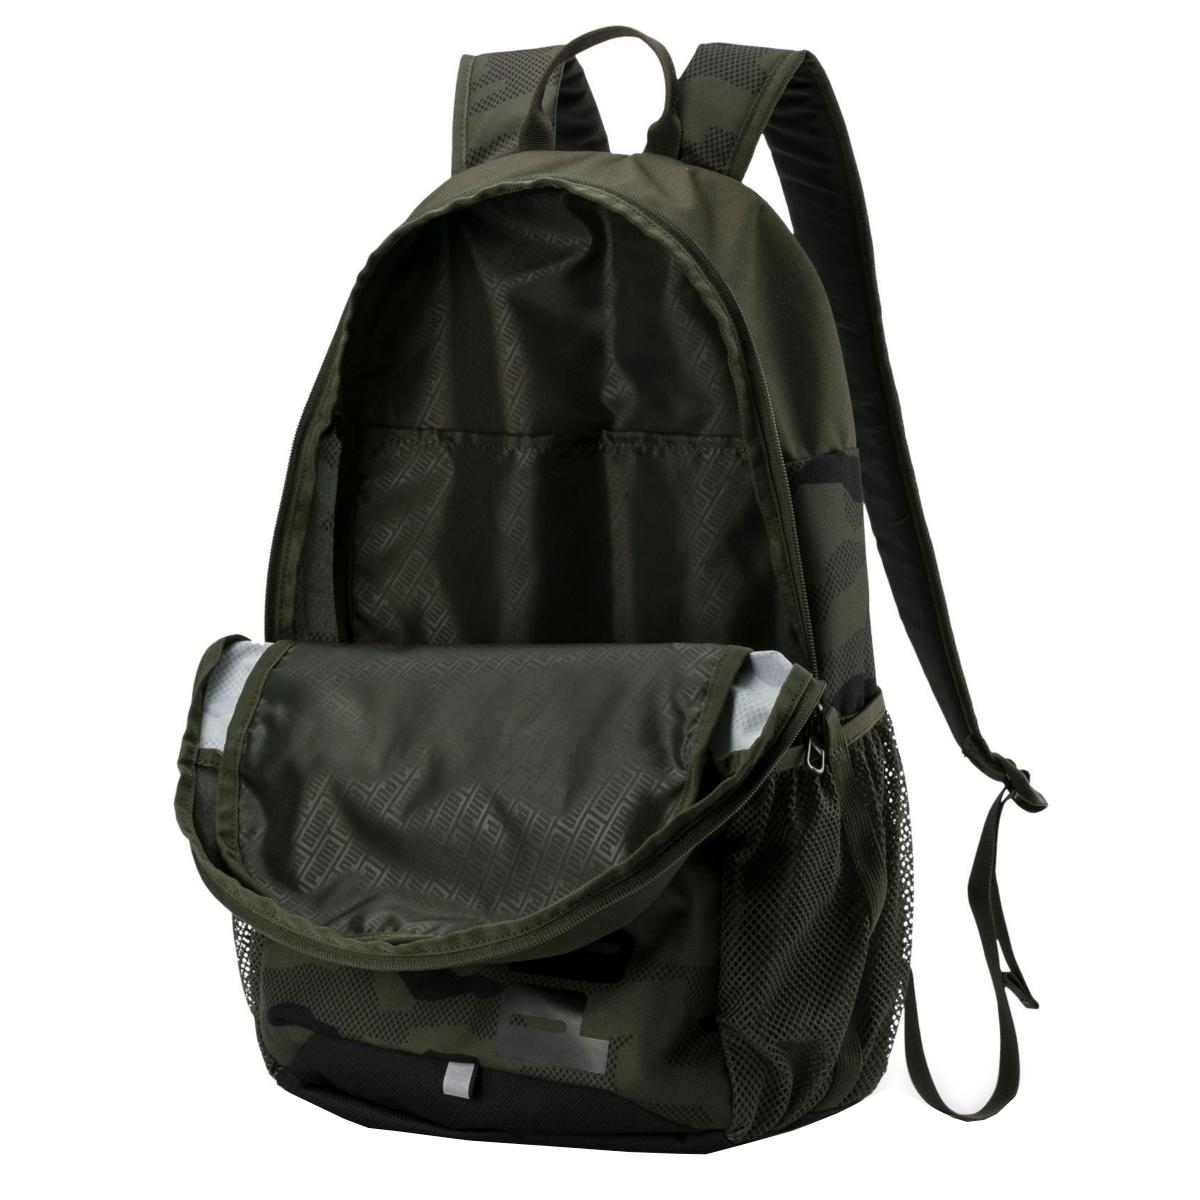 PUMA Style Backpack Forest Night-Camo AO